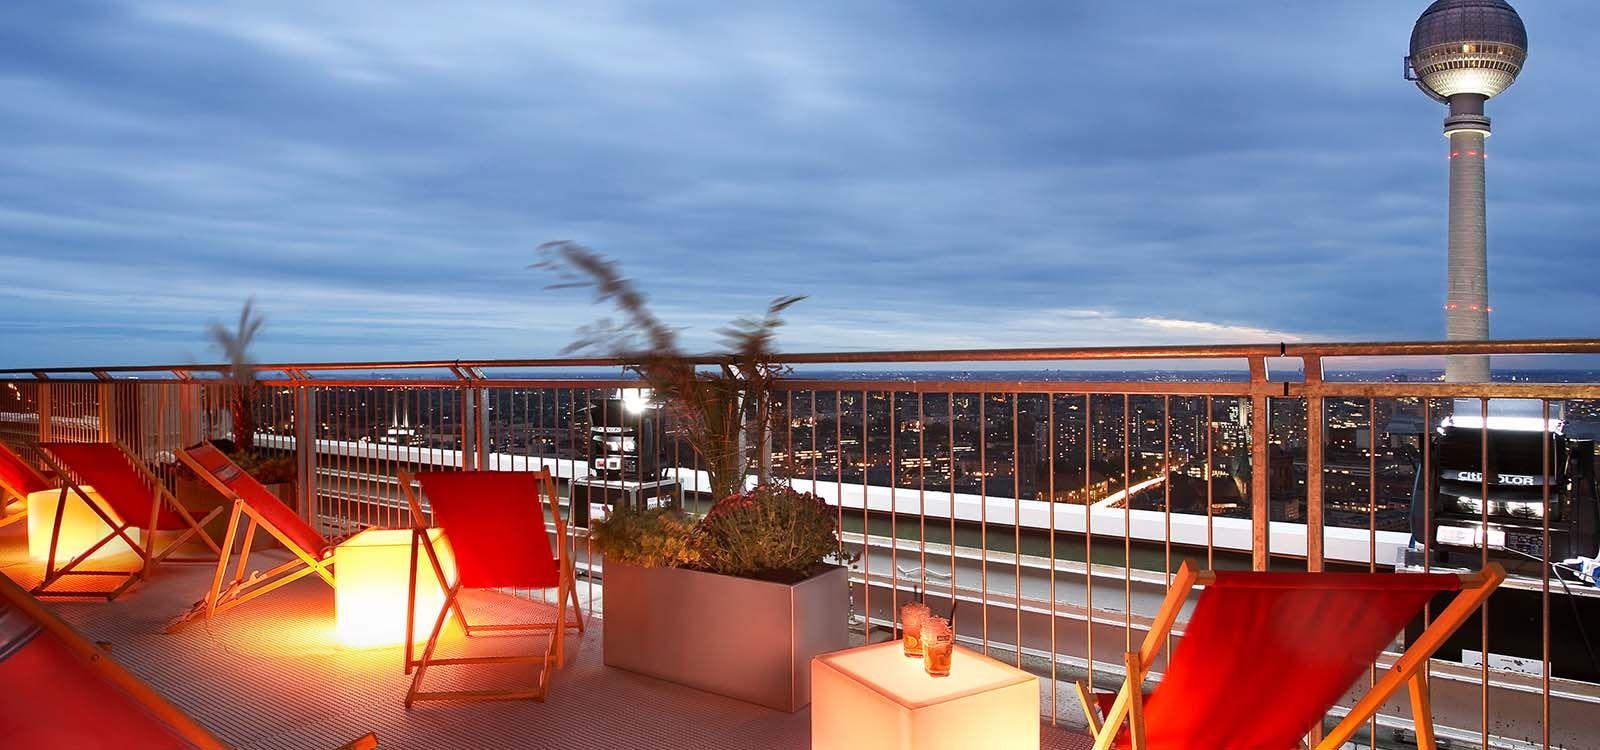 Pictures Videos Park Inn Hotel Berlin Hotels Hotel Berlin Berlin Park